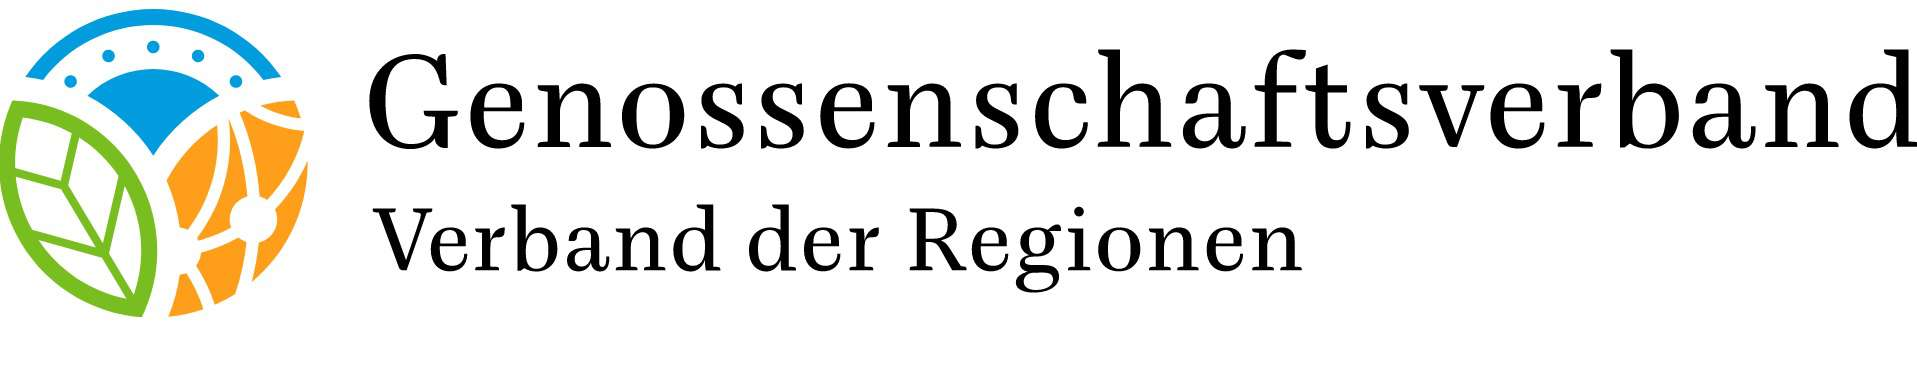 Logo des Genossenschaftsverbands